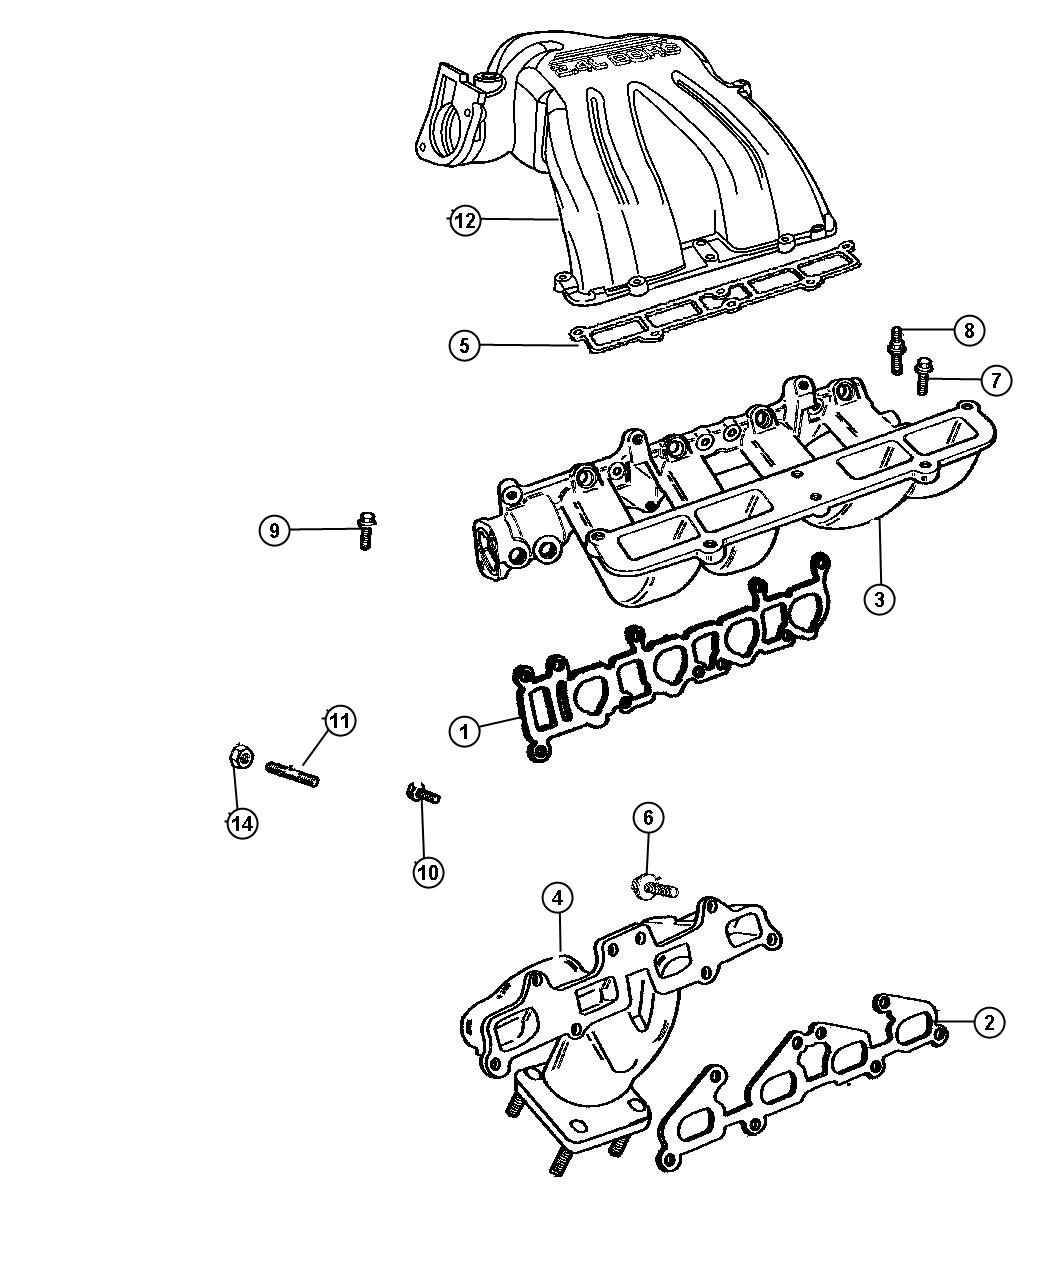 Oem Dodge Caravan Right Exhaust Manifold 4448909: 2006 Dodge Caravan Manifolds, Intake And Exhaust 2.4L [EDZ]